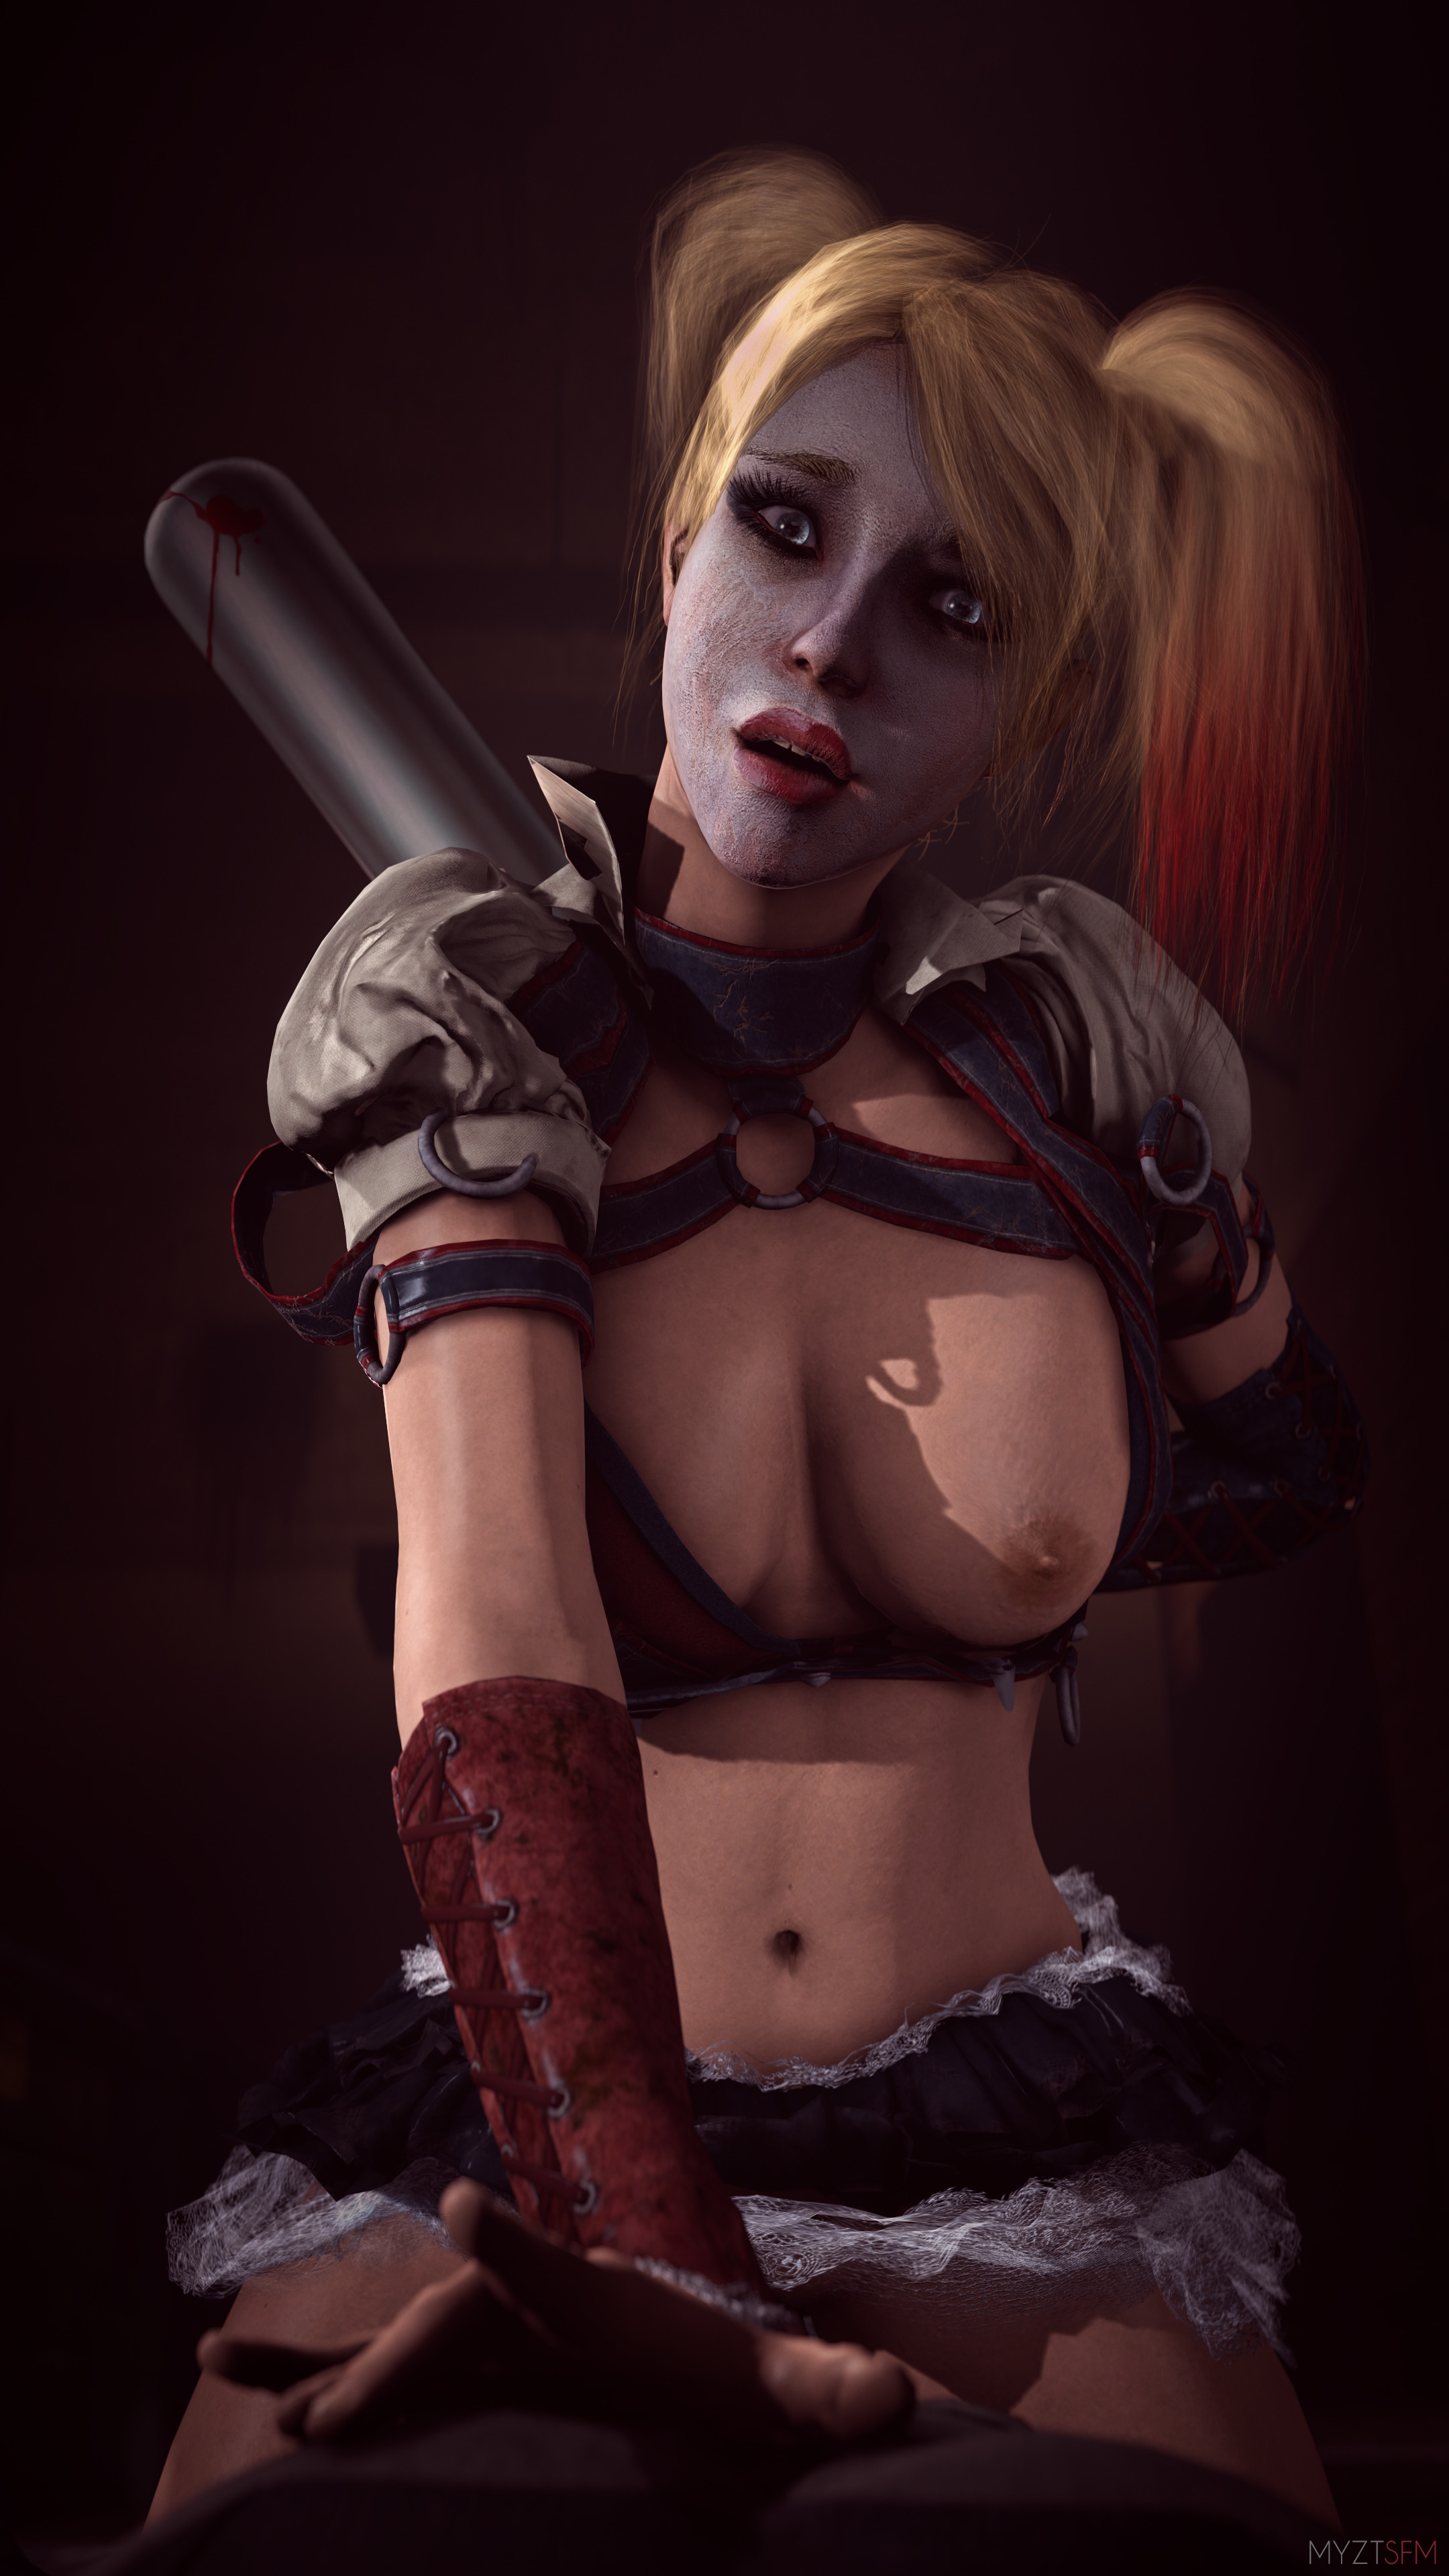 Batman arkham knight harley quinn nude